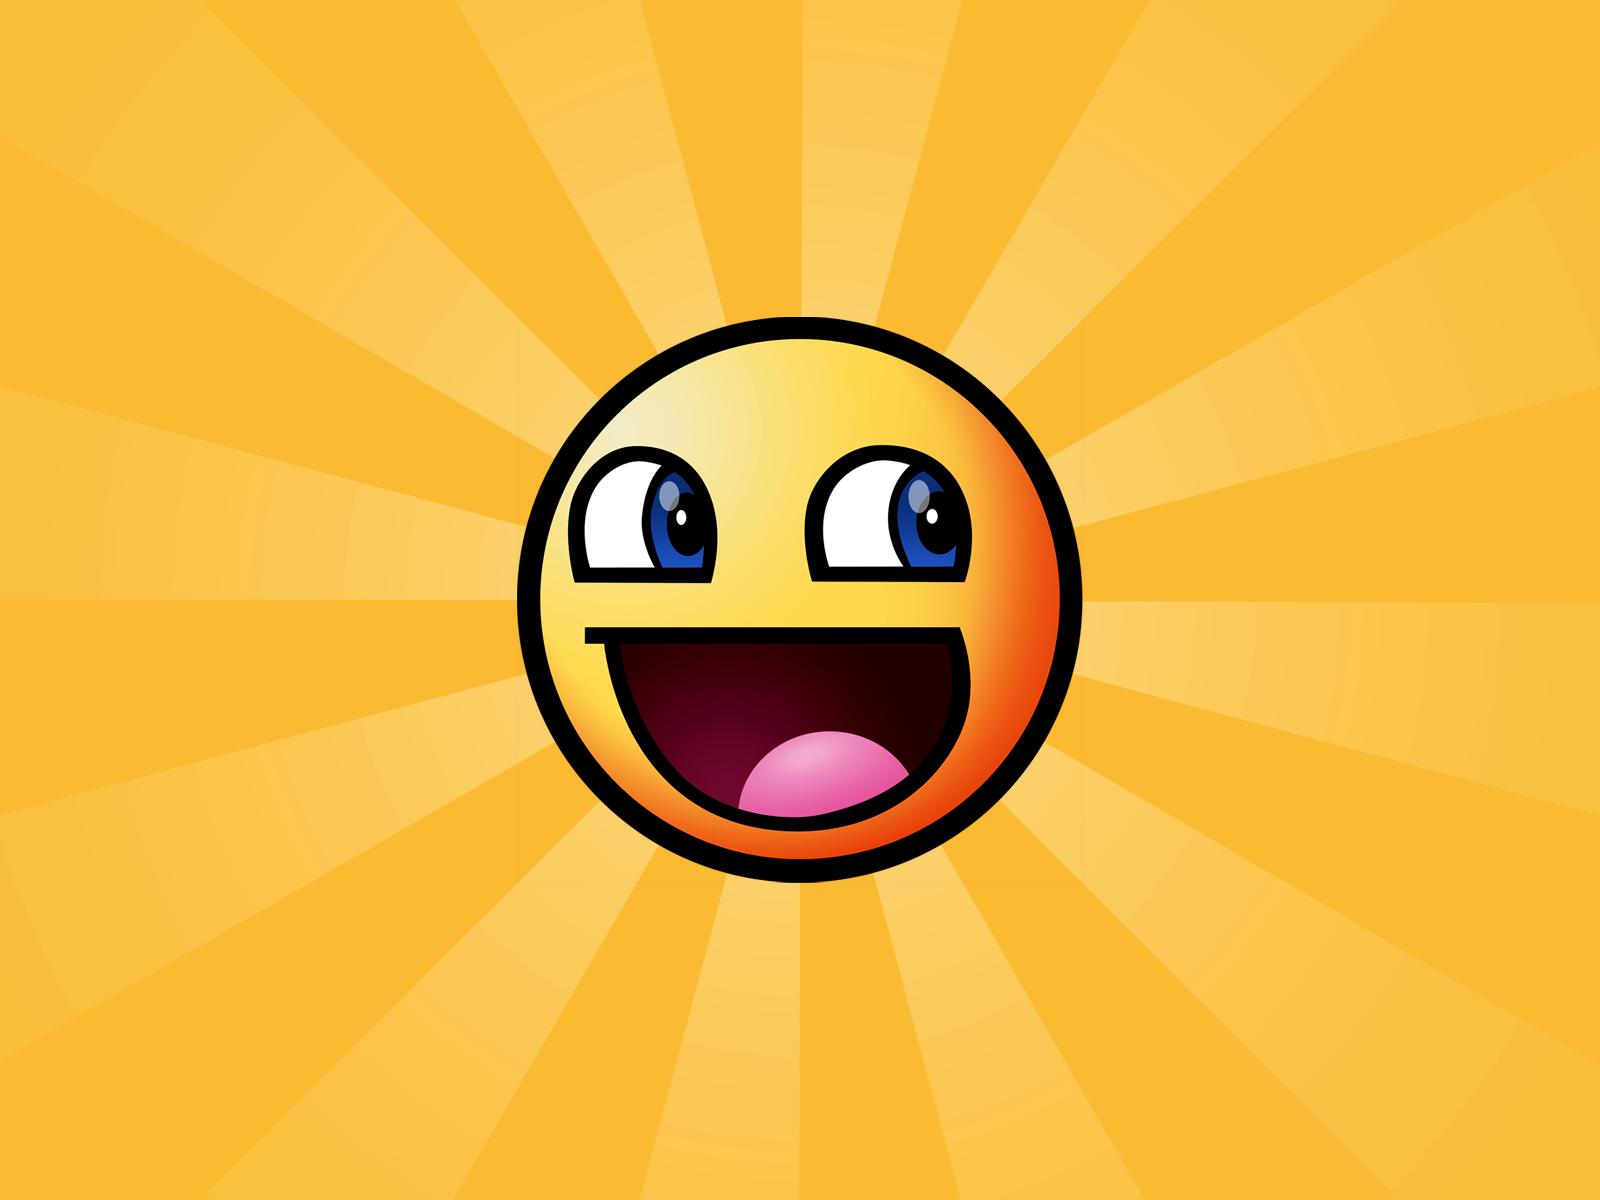 Awesome Smiley Face Wallpaper 2455 1600 x 1200   WallpaperLayercom 1600x1200